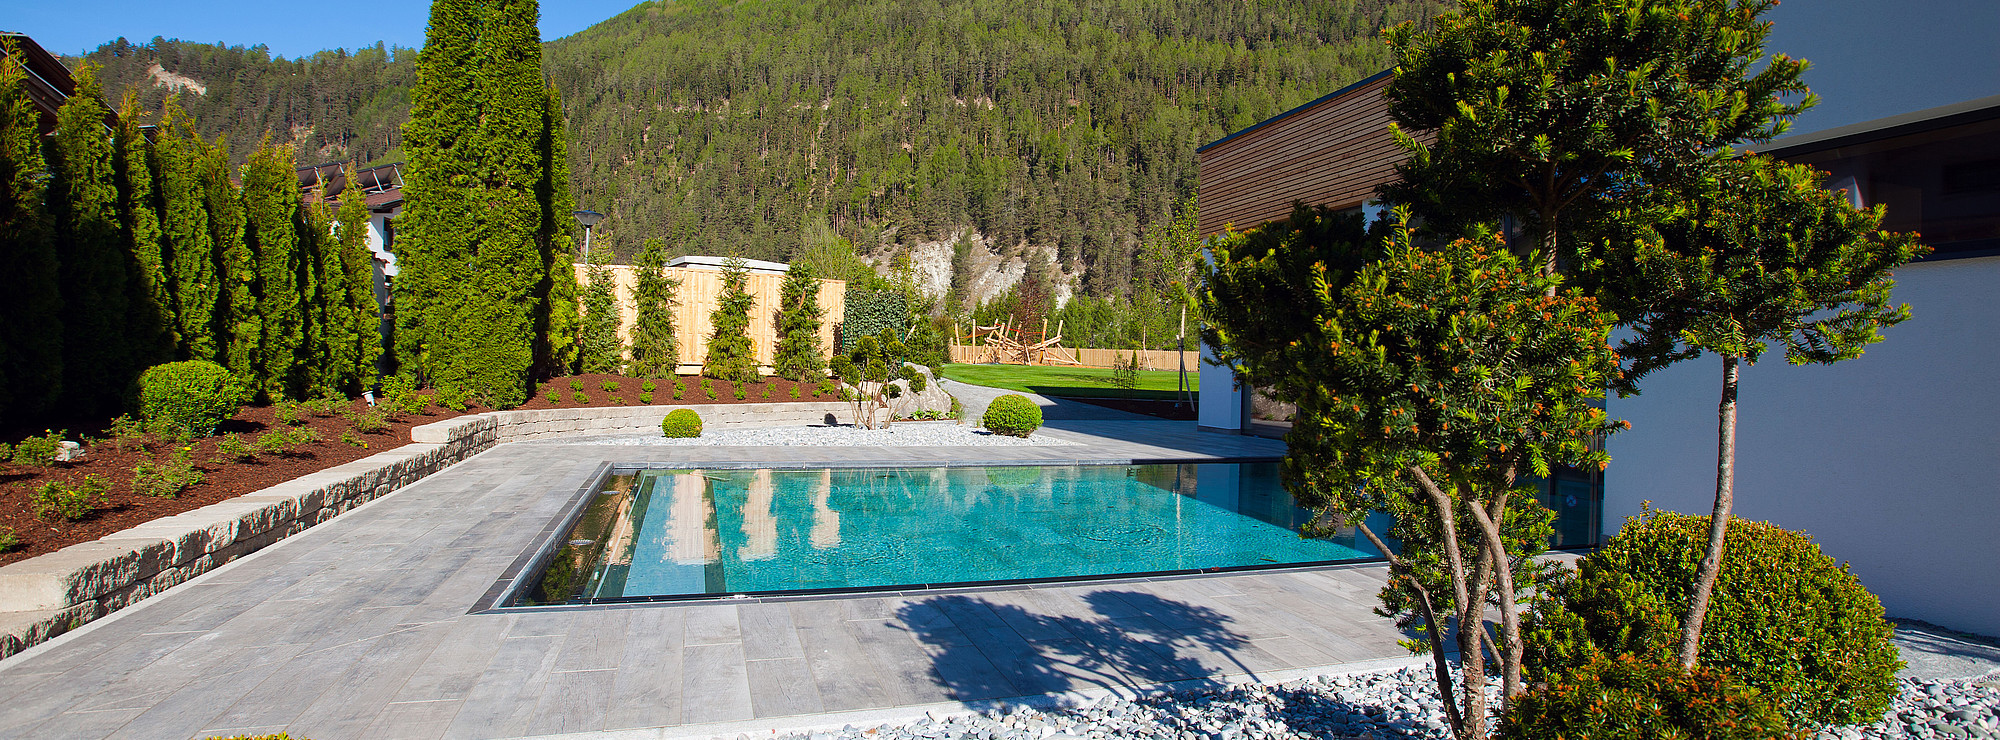 beautiful gartenanlage mit pool gallery. Black Bedroom Furniture Sets. Home Design Ideas